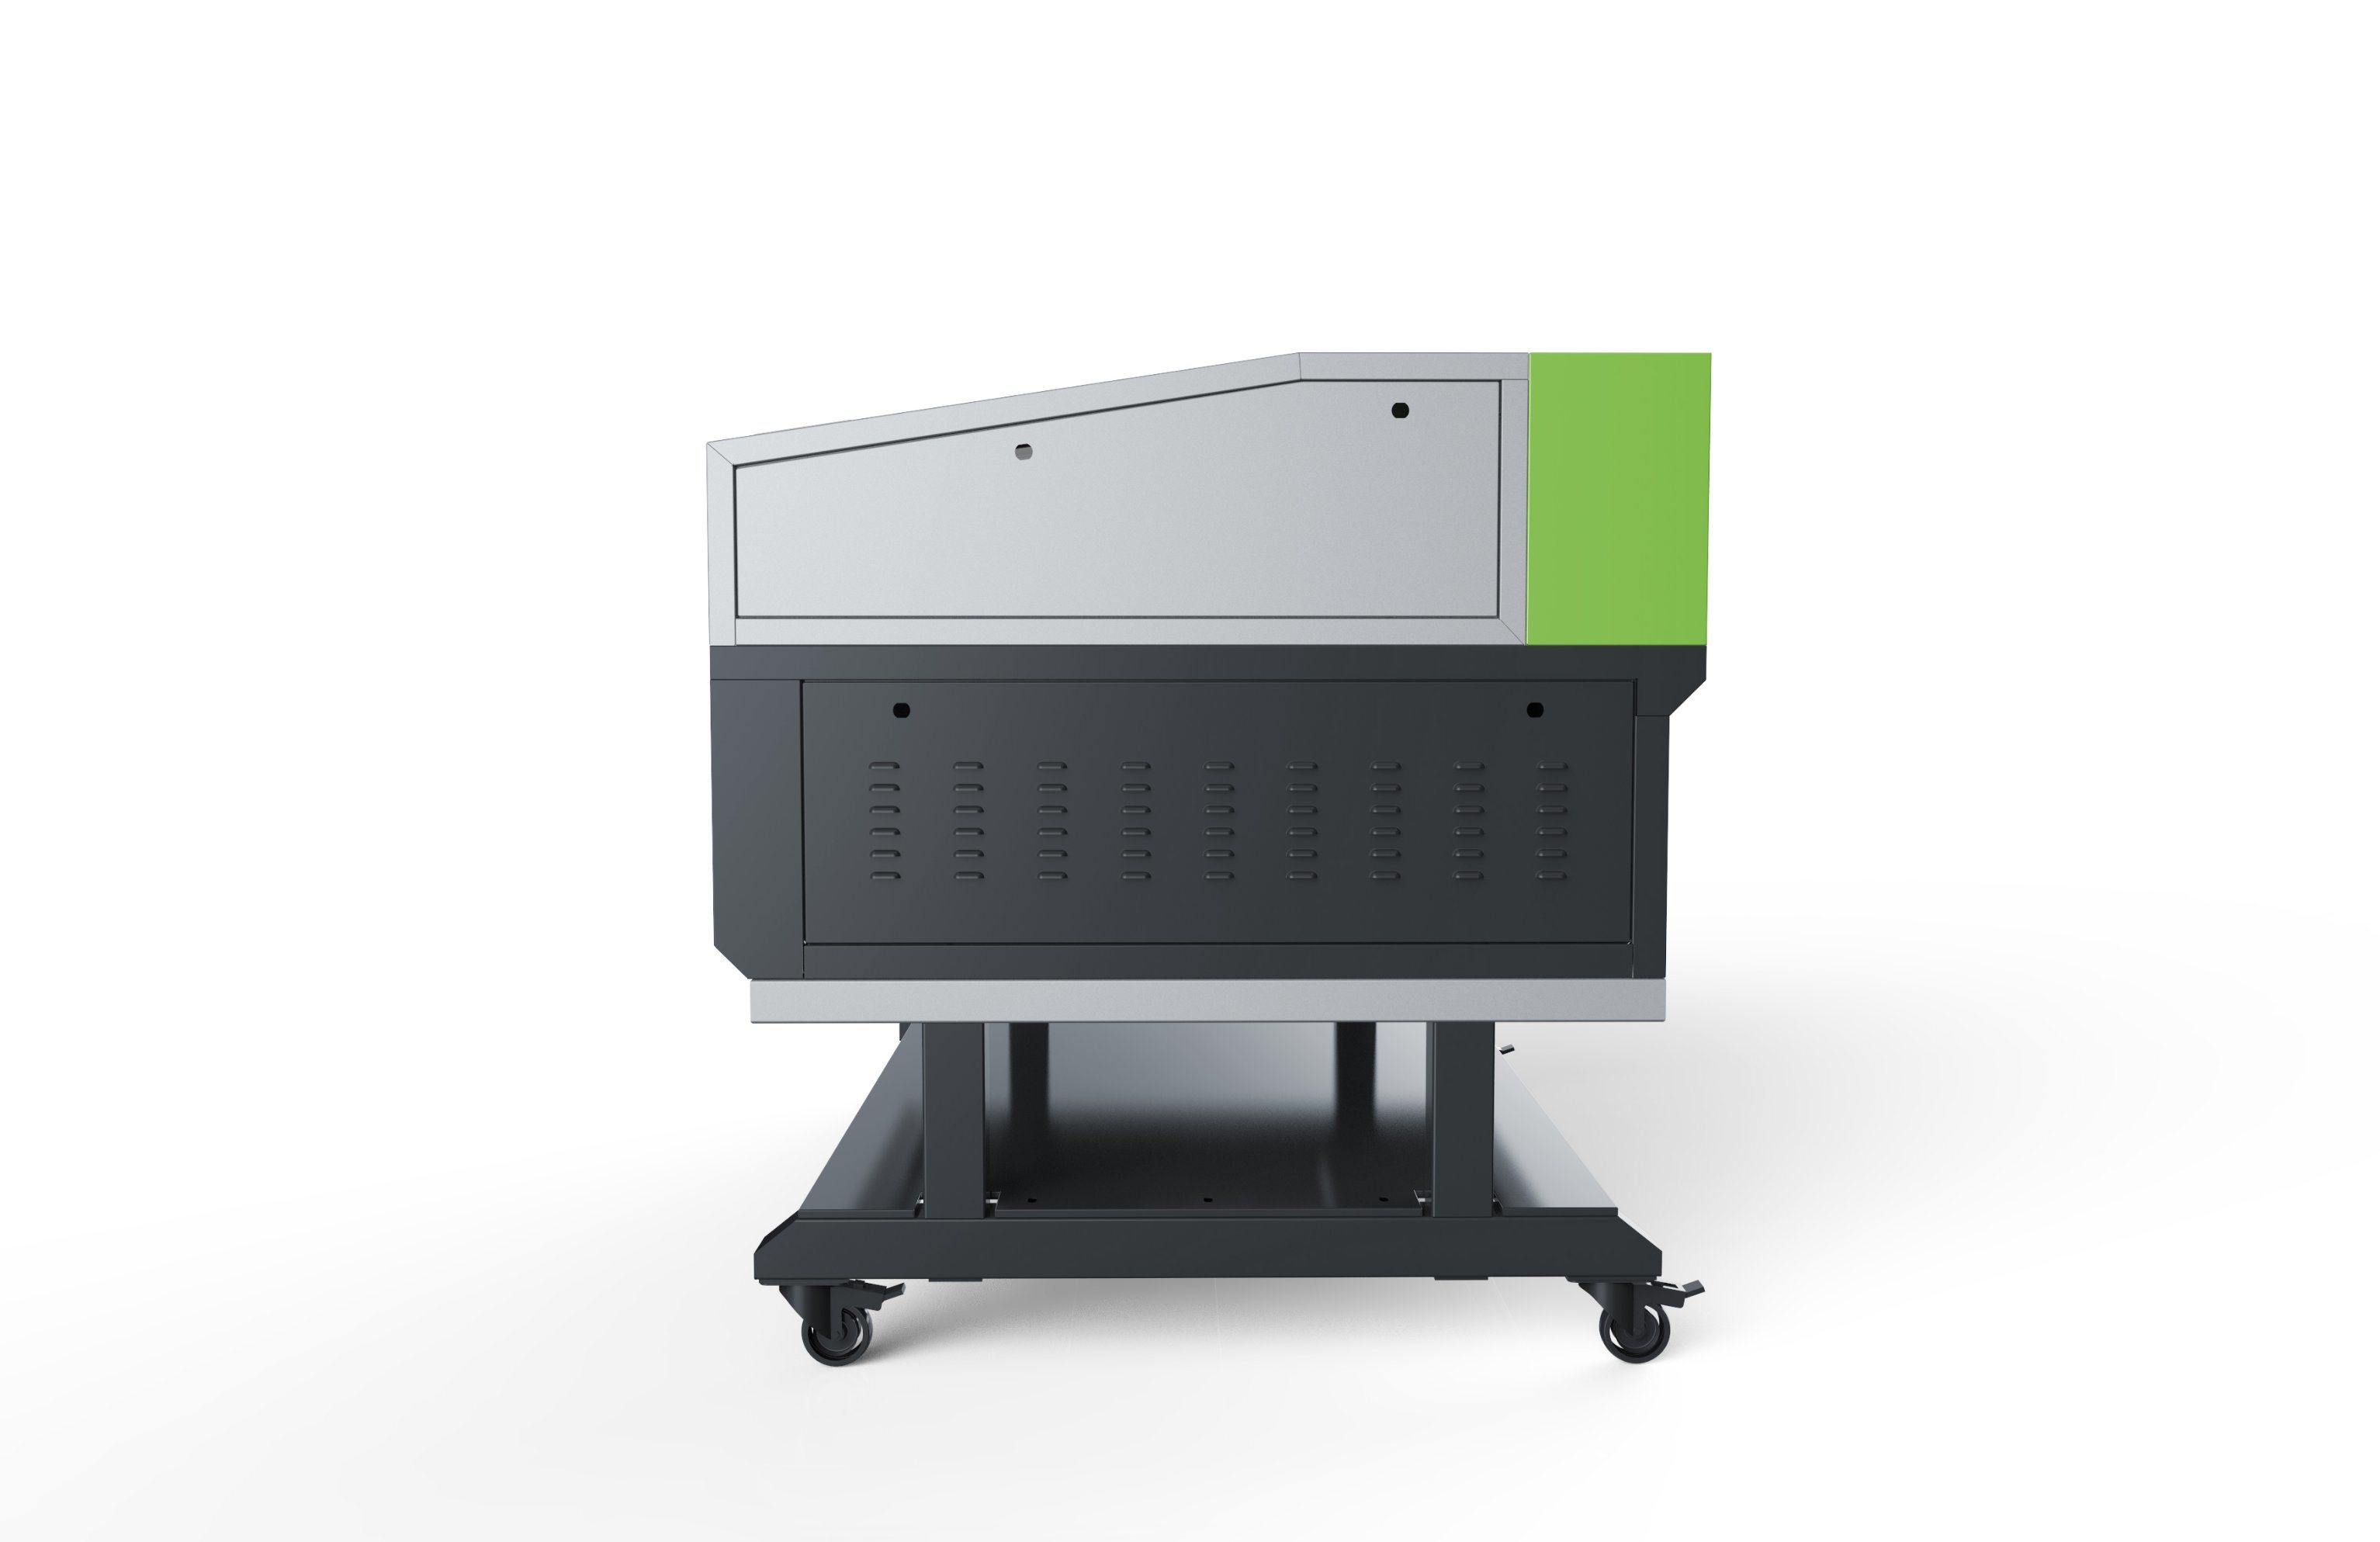 Es-9060 of Laser Engraving Machine